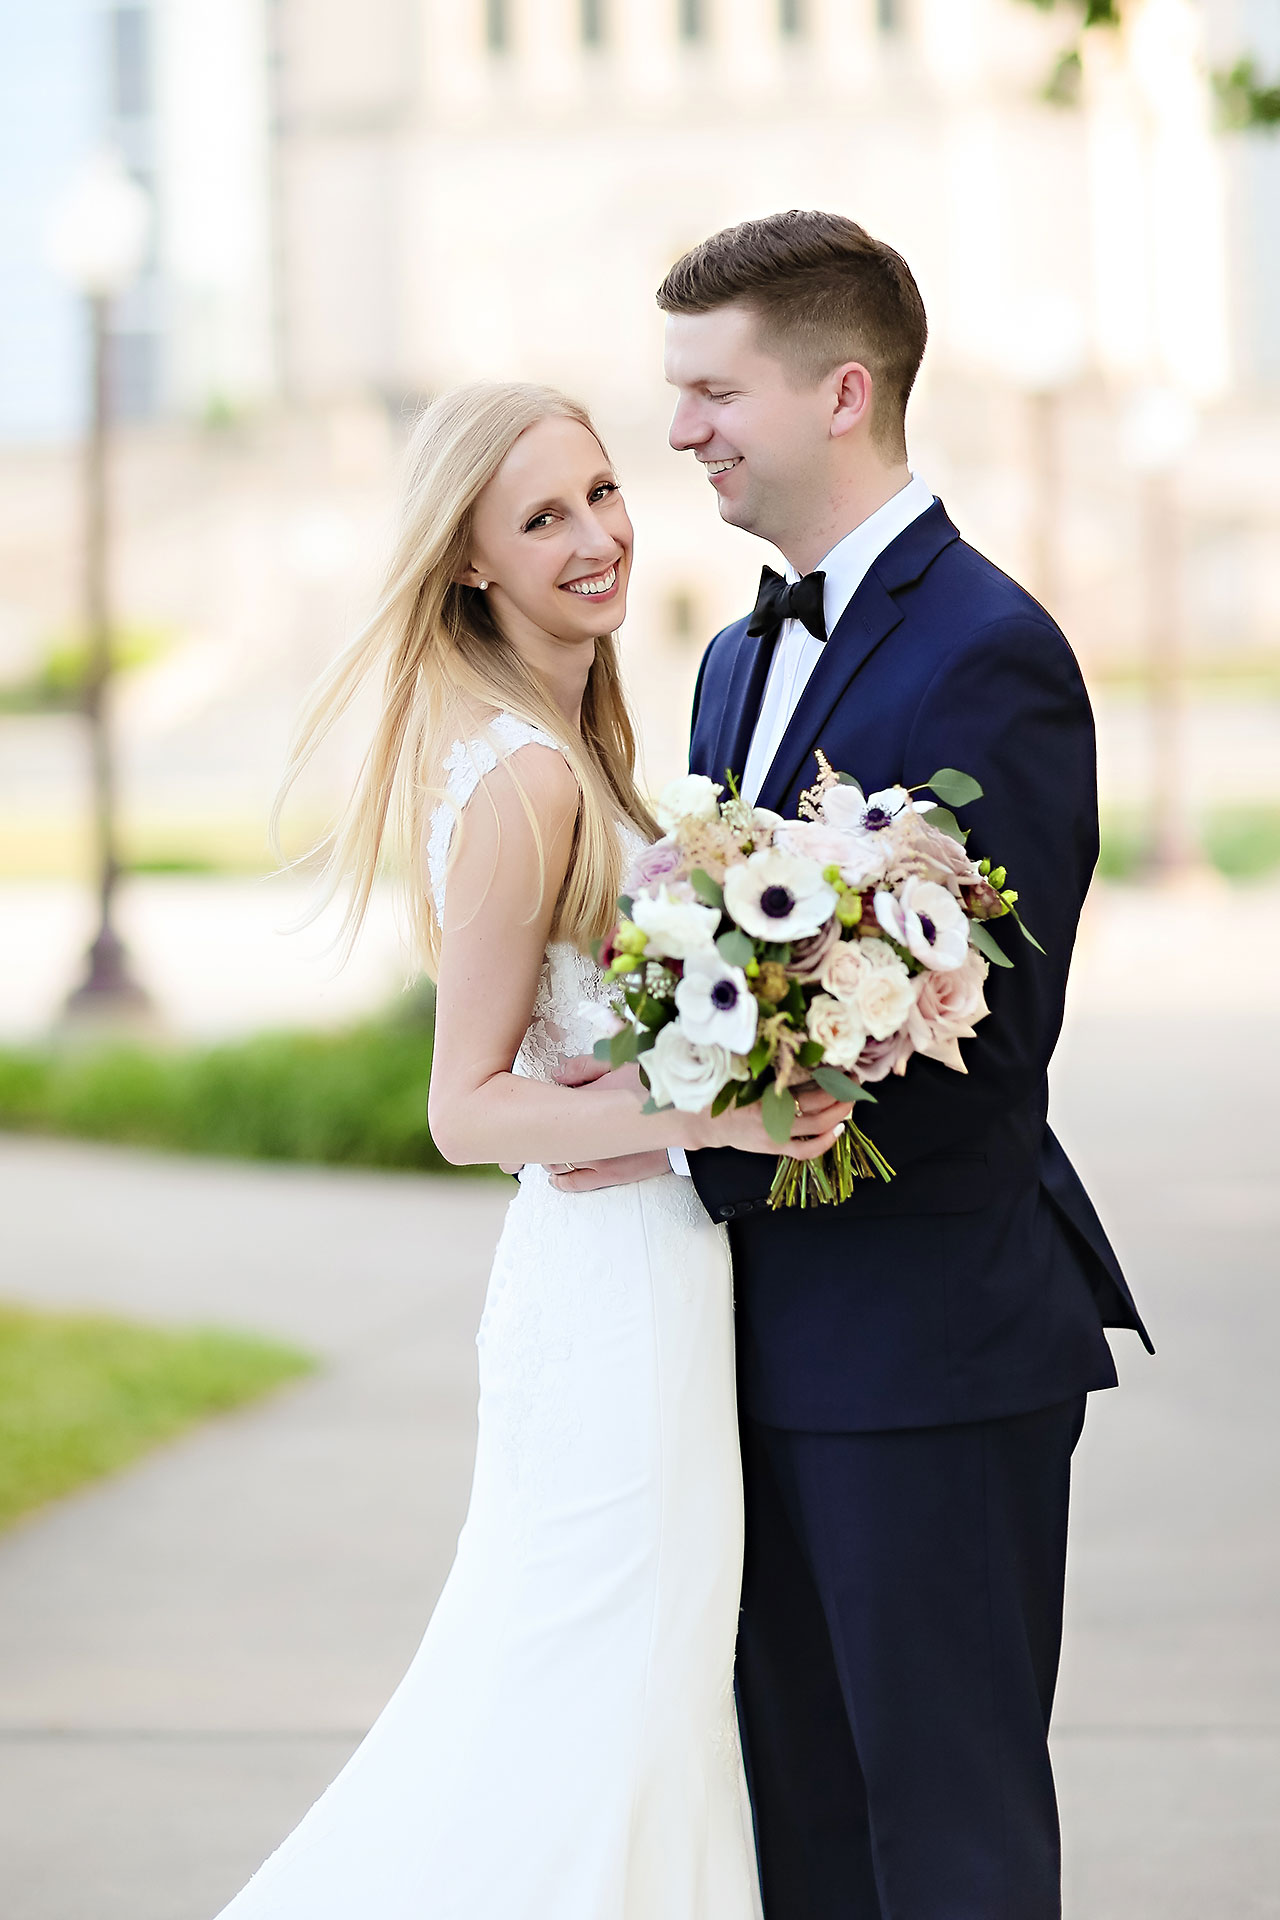 Molly Declan Scottish Rite Indianapolis Wedding 153